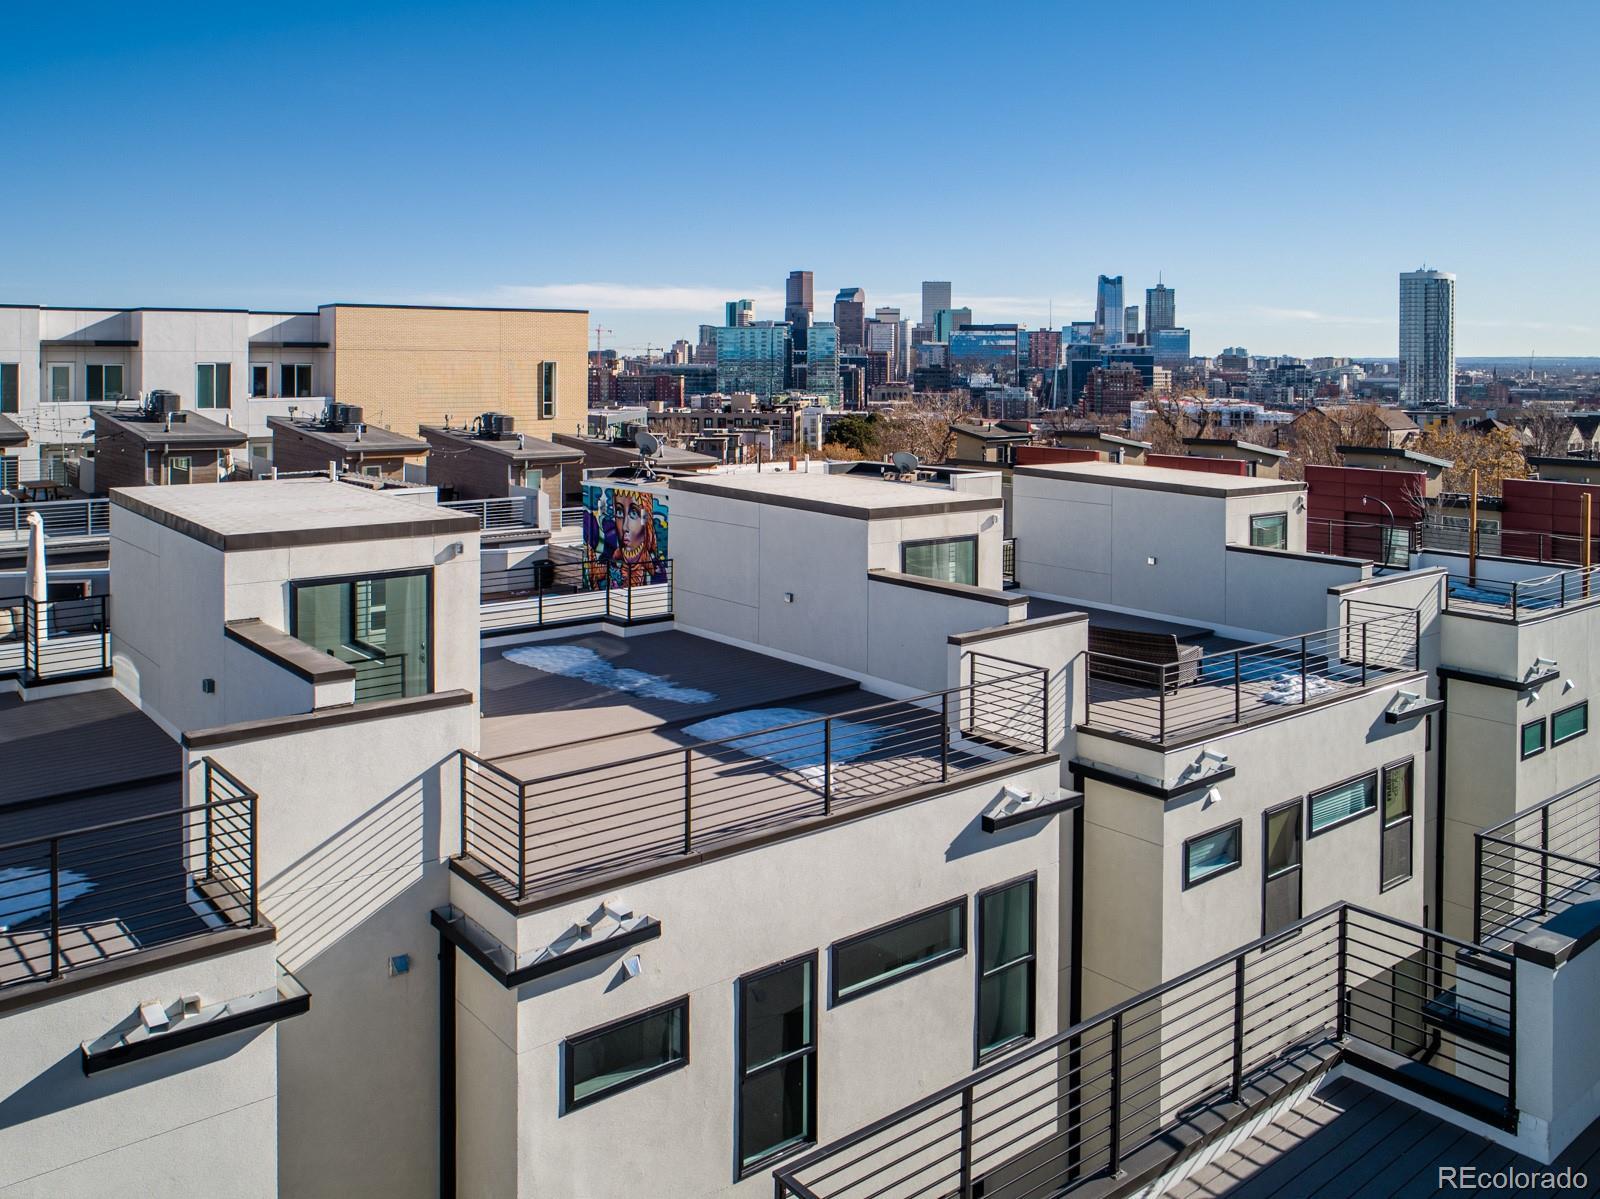 MLS# 1970434 - 12 - 3206 N Vallejo Street, Denver, CO 80211